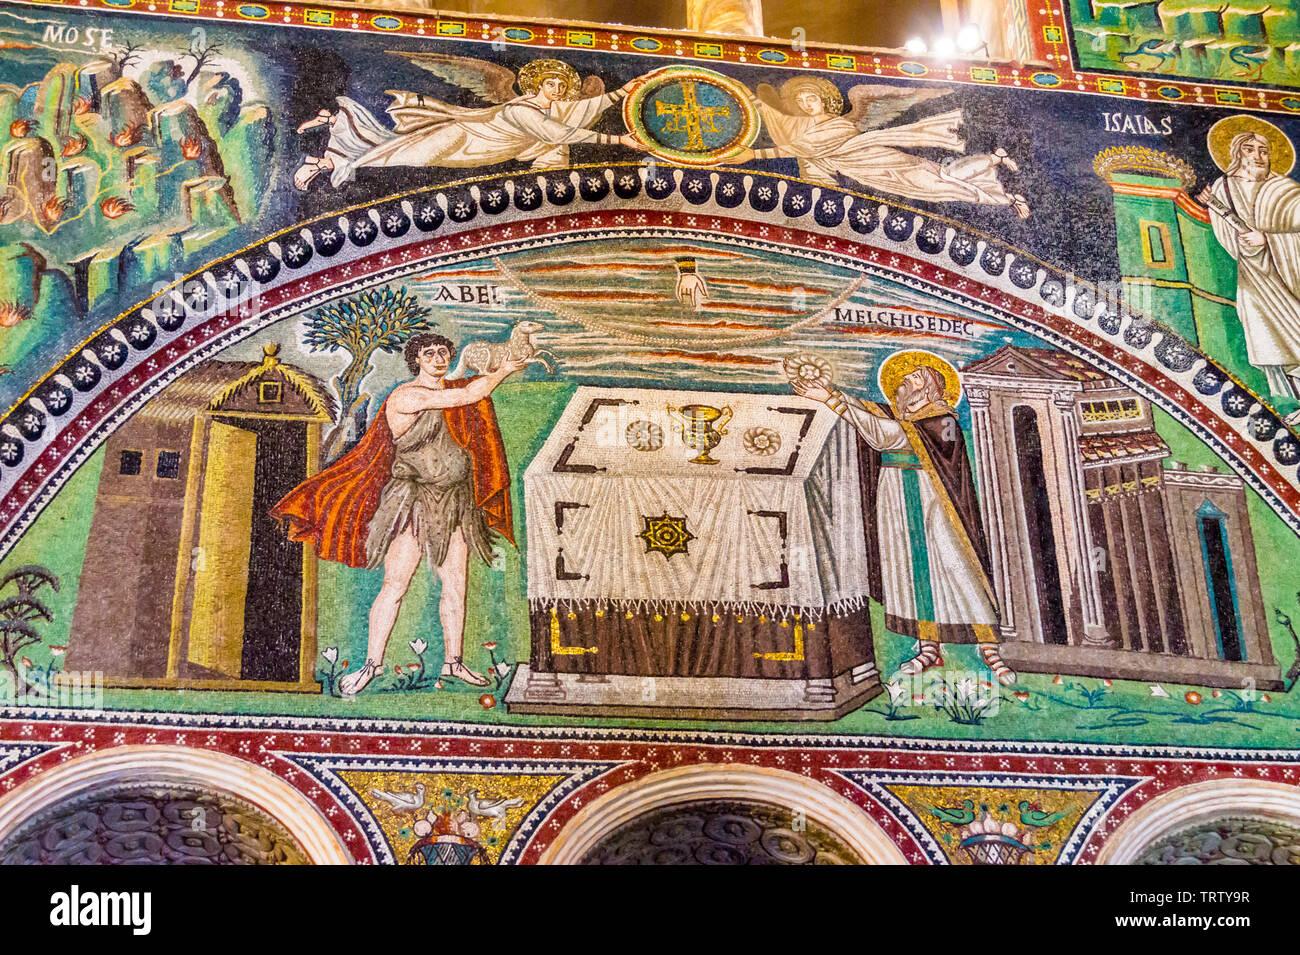 mosaic-of-abel-and-melchisedec-basilica-of-san-vitale-ad547-mosaic-ravenna-emilia-romagna-italy-TRTY9R.jpg